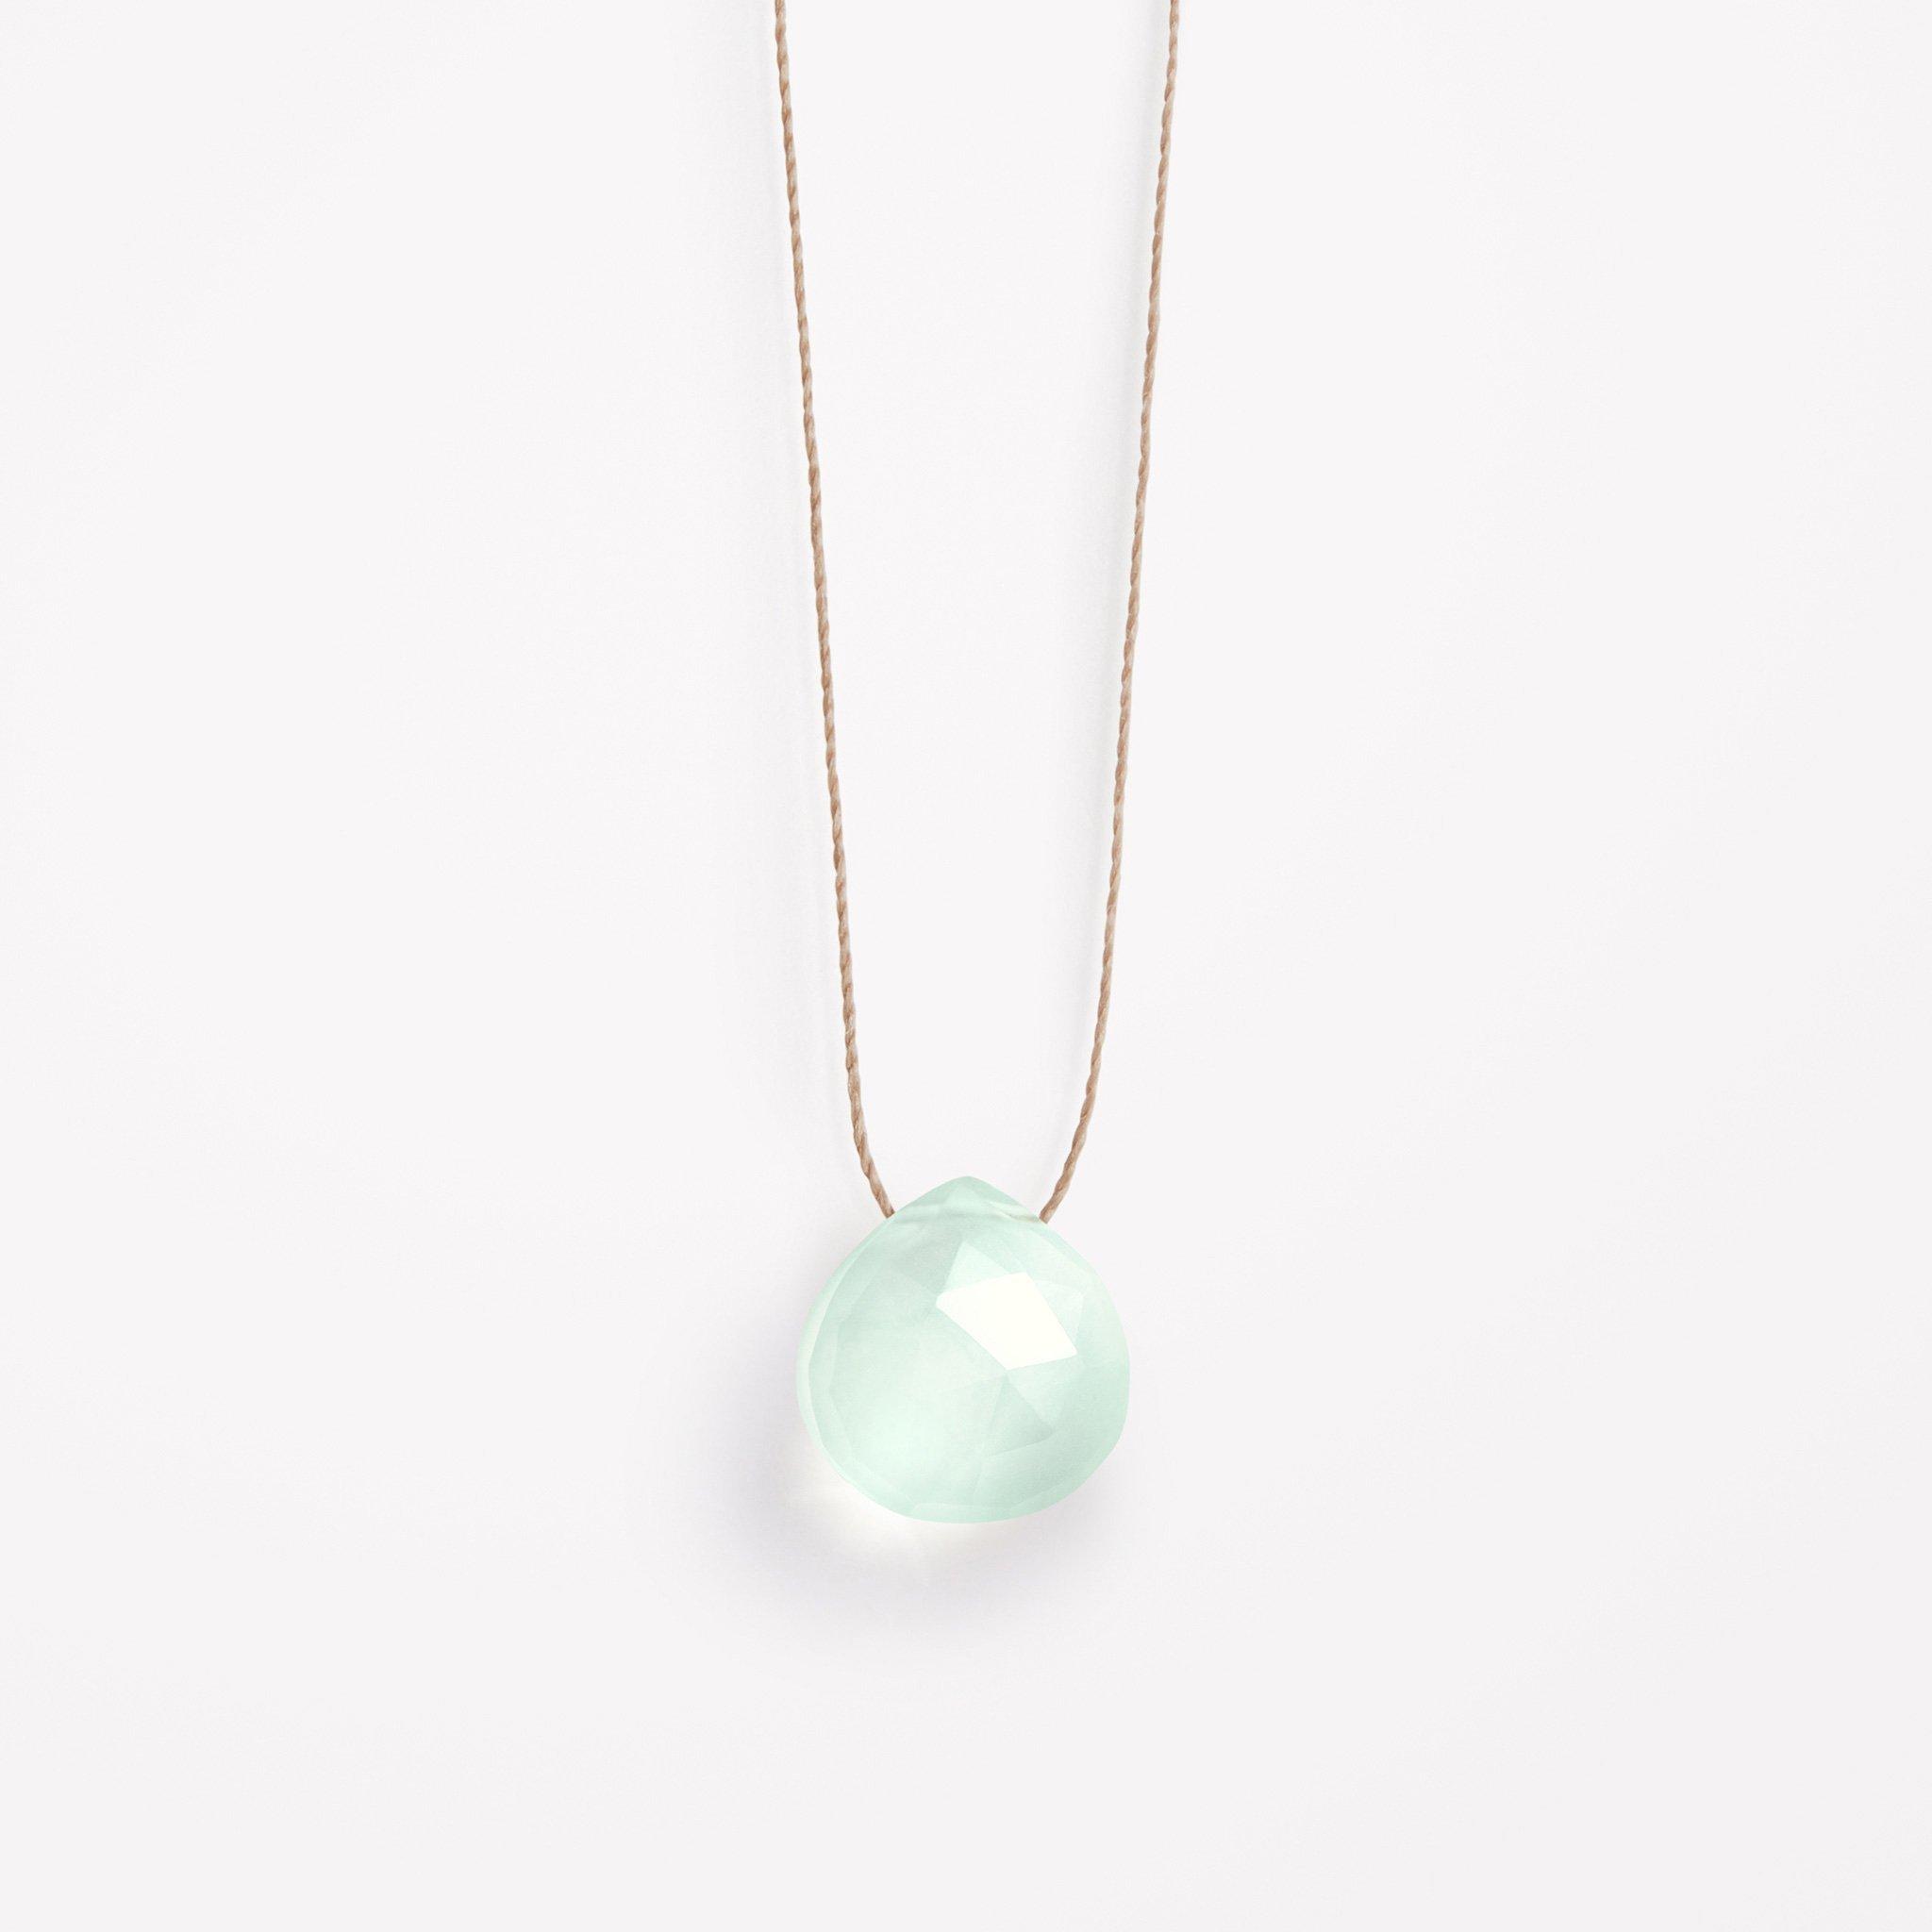 Sea Glass Chalcedony Necklace